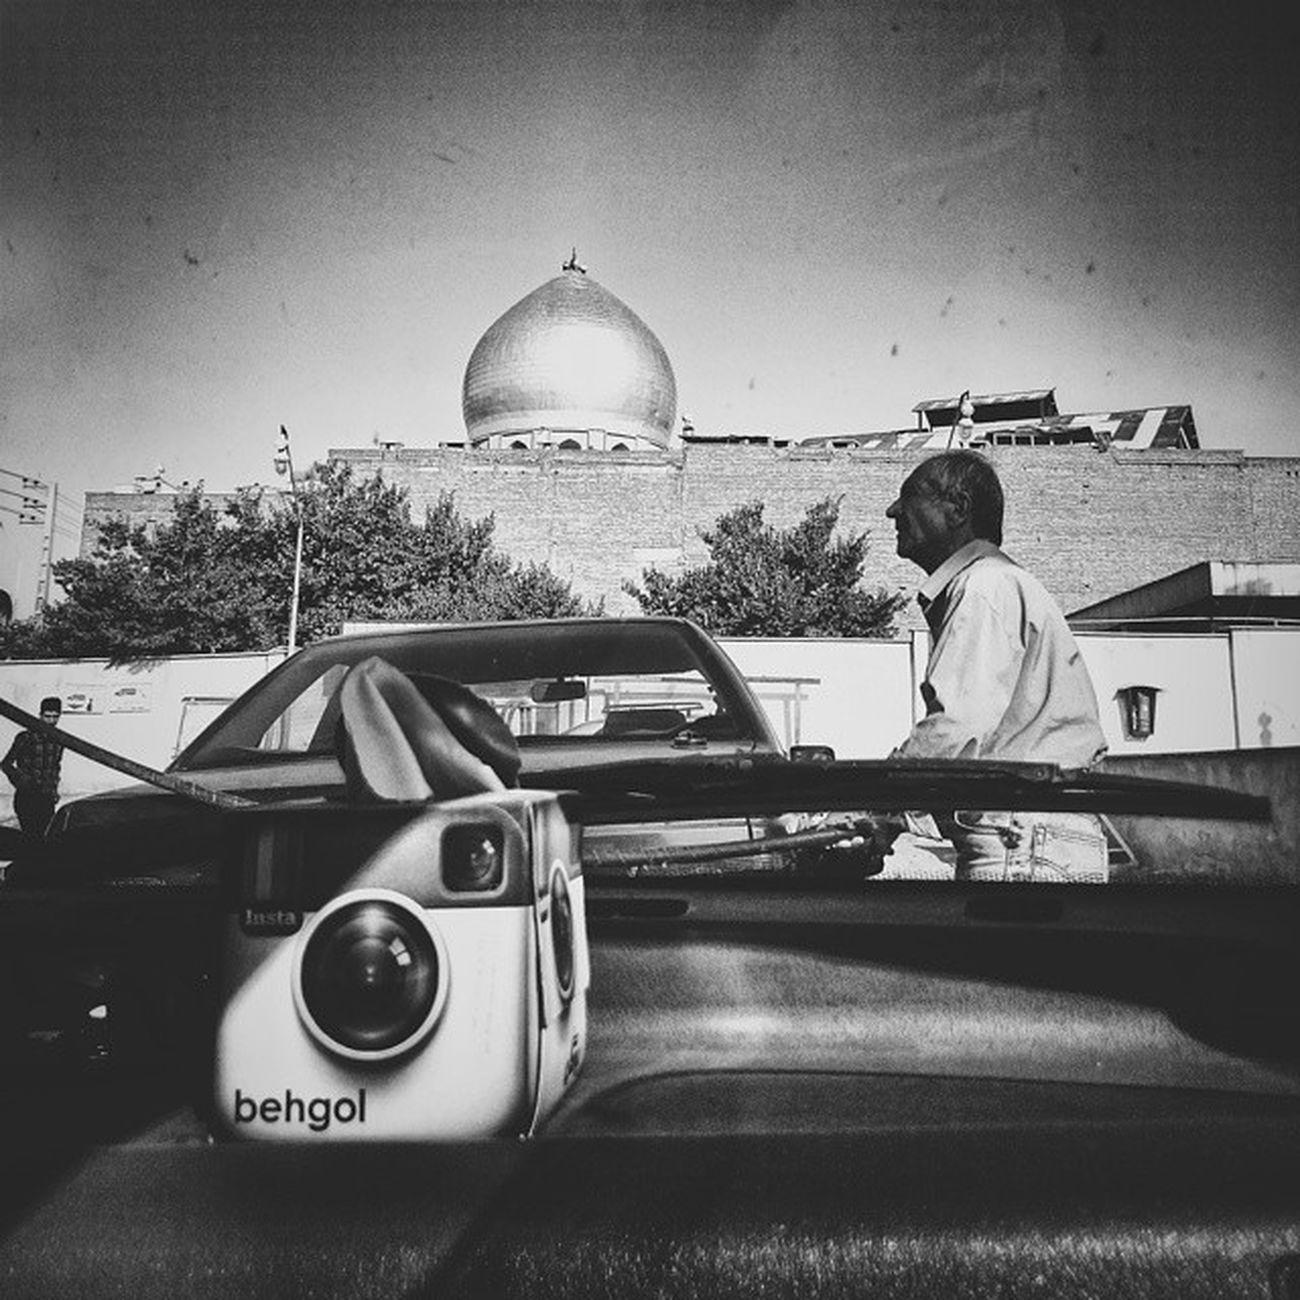 At gas station in Damavand (دماوند) ⛽ Vscocam Snapseed Vscogoodshot Daily dailylife car gas fuel travel mosque mobilephotography monochrome mobilegraphy blackandwhite bnw_worldwide bnwiran bnw bw_photooftheday picoftheday photodocumentary photooftheday everydayiran everyday everywheredaily instagram